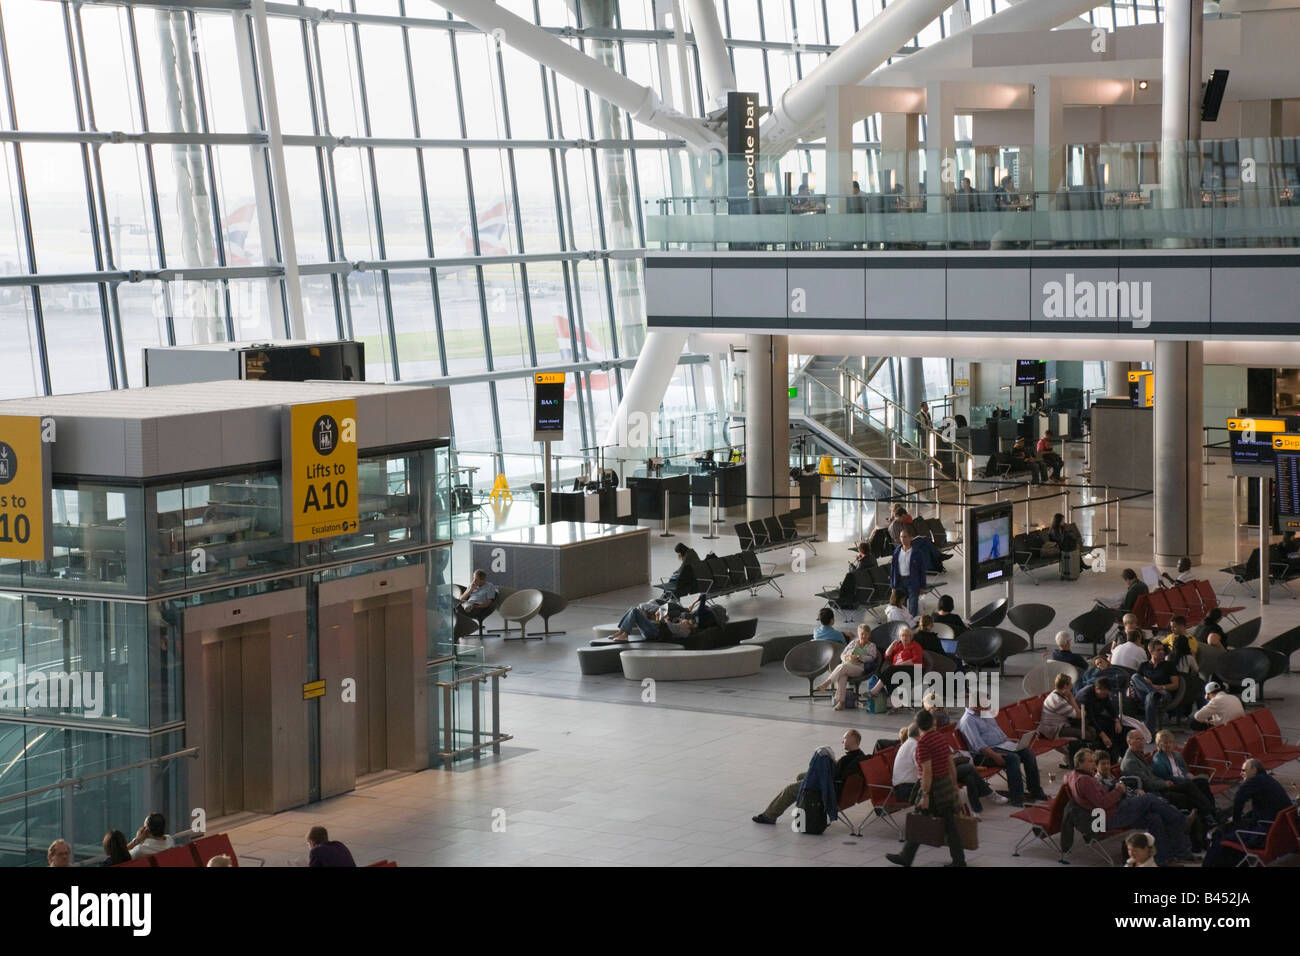 People in London's Heathrow Airport British Airways departures lounge inside Terminal 5 building England UK - Stock Image